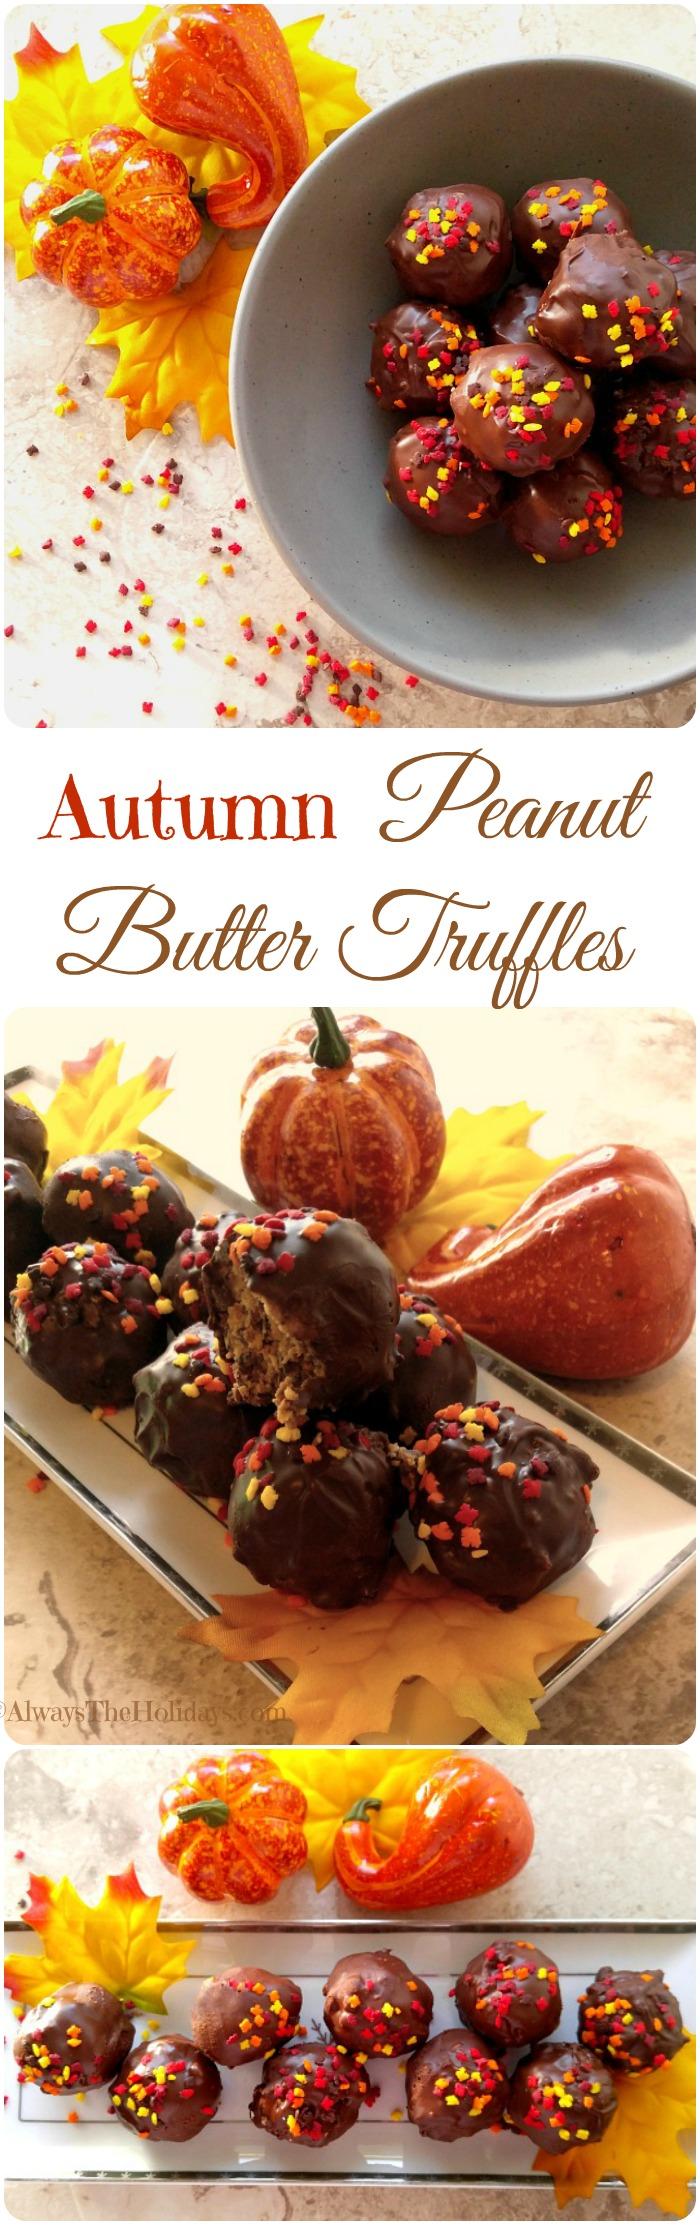 Autumn truffle